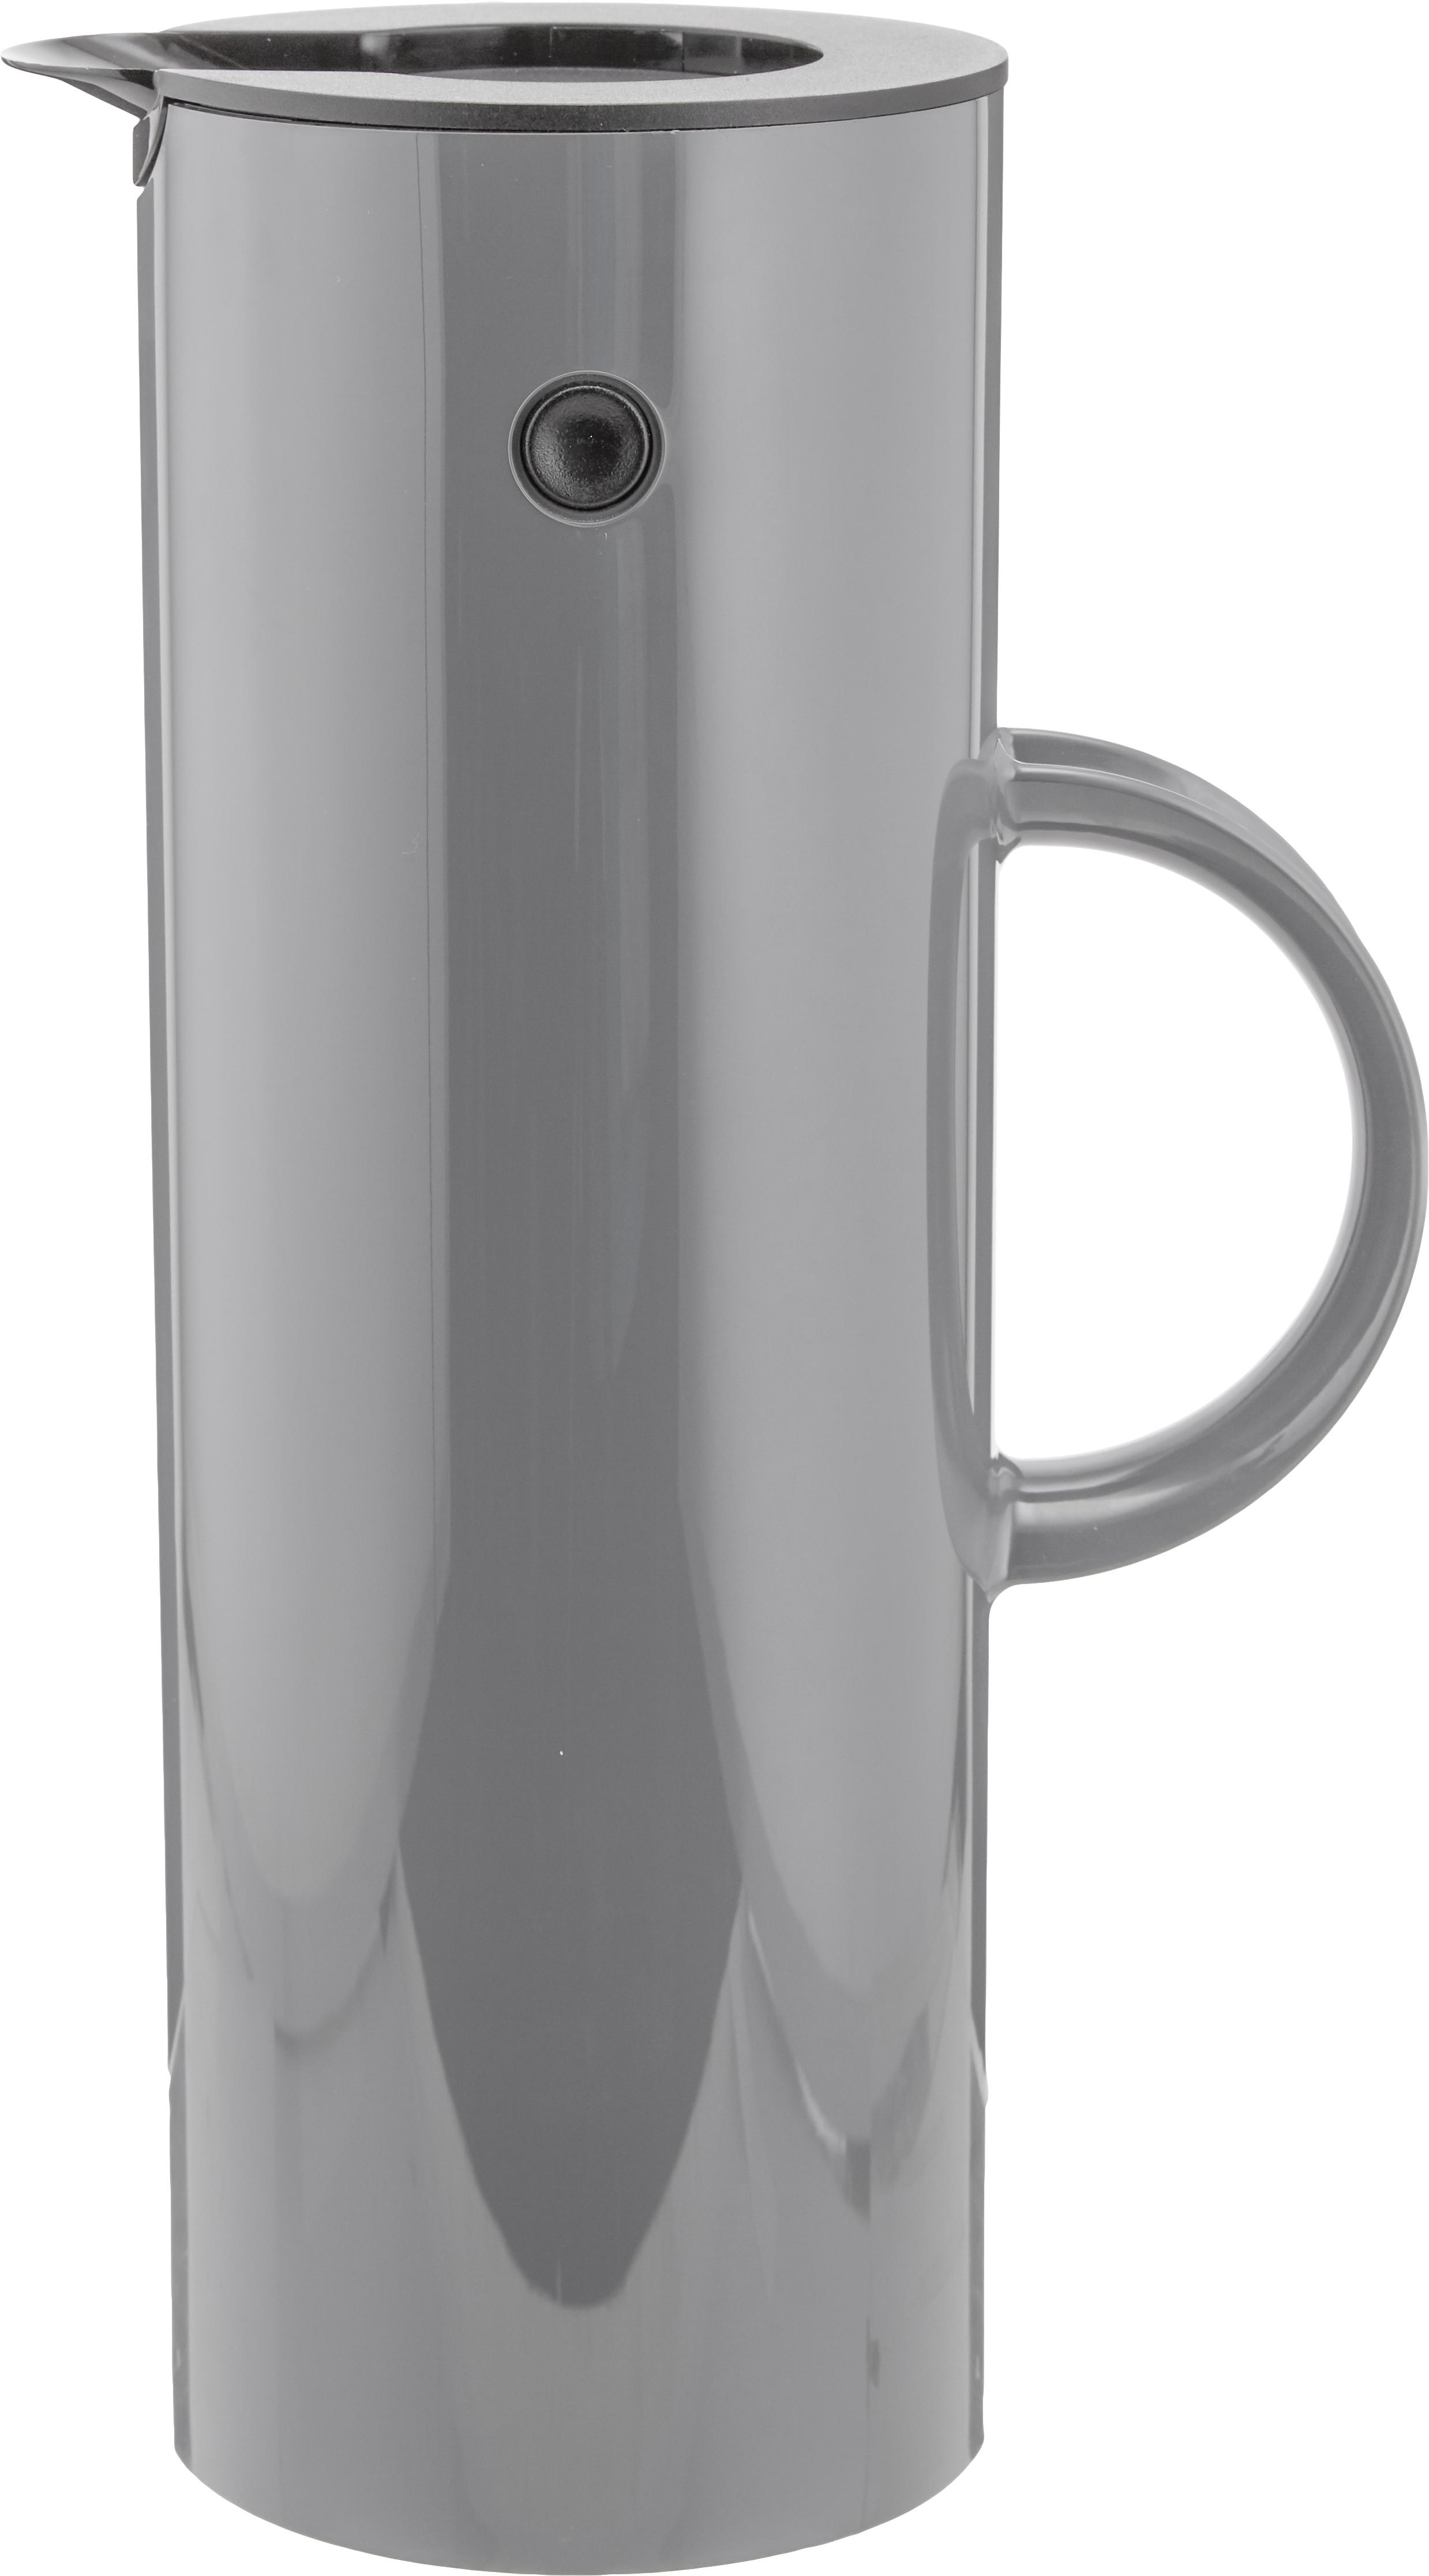 Termo EM77, Plástico ABS, interior con inserto de vidrio, Gris granito, 1 L